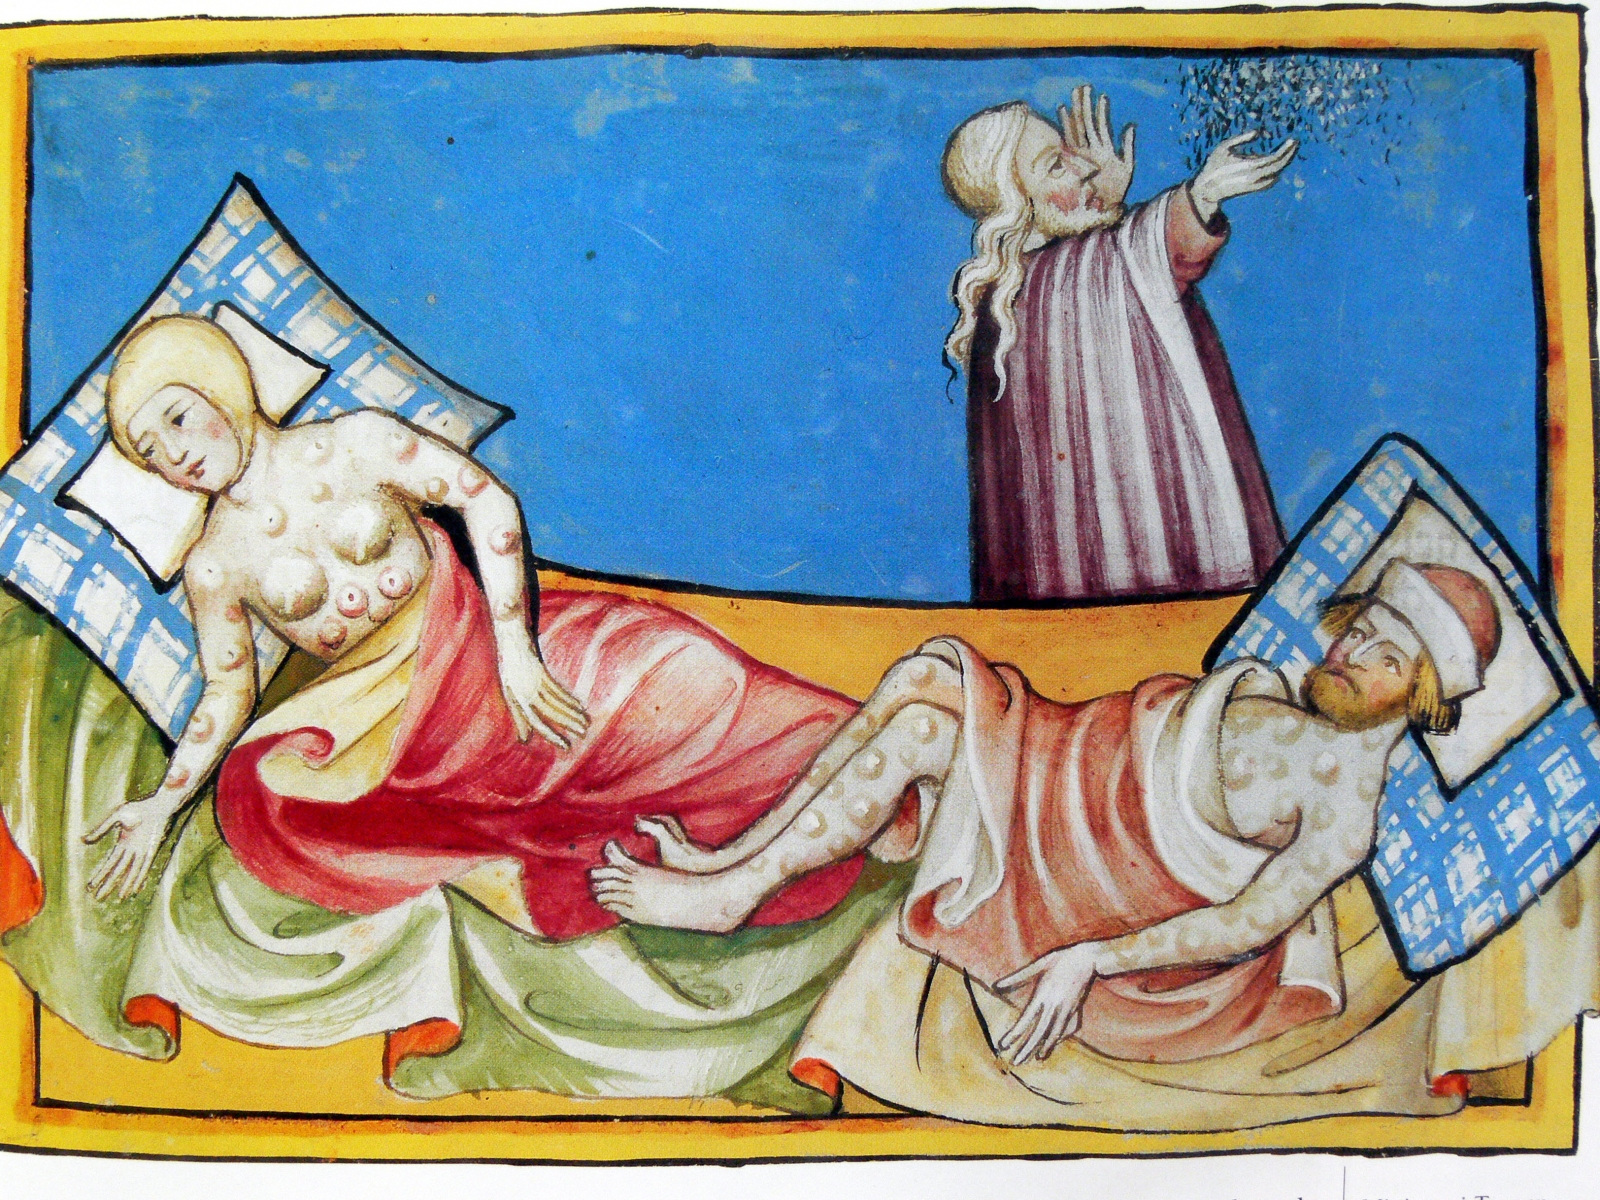 stredovekkriza-smallpox01-original